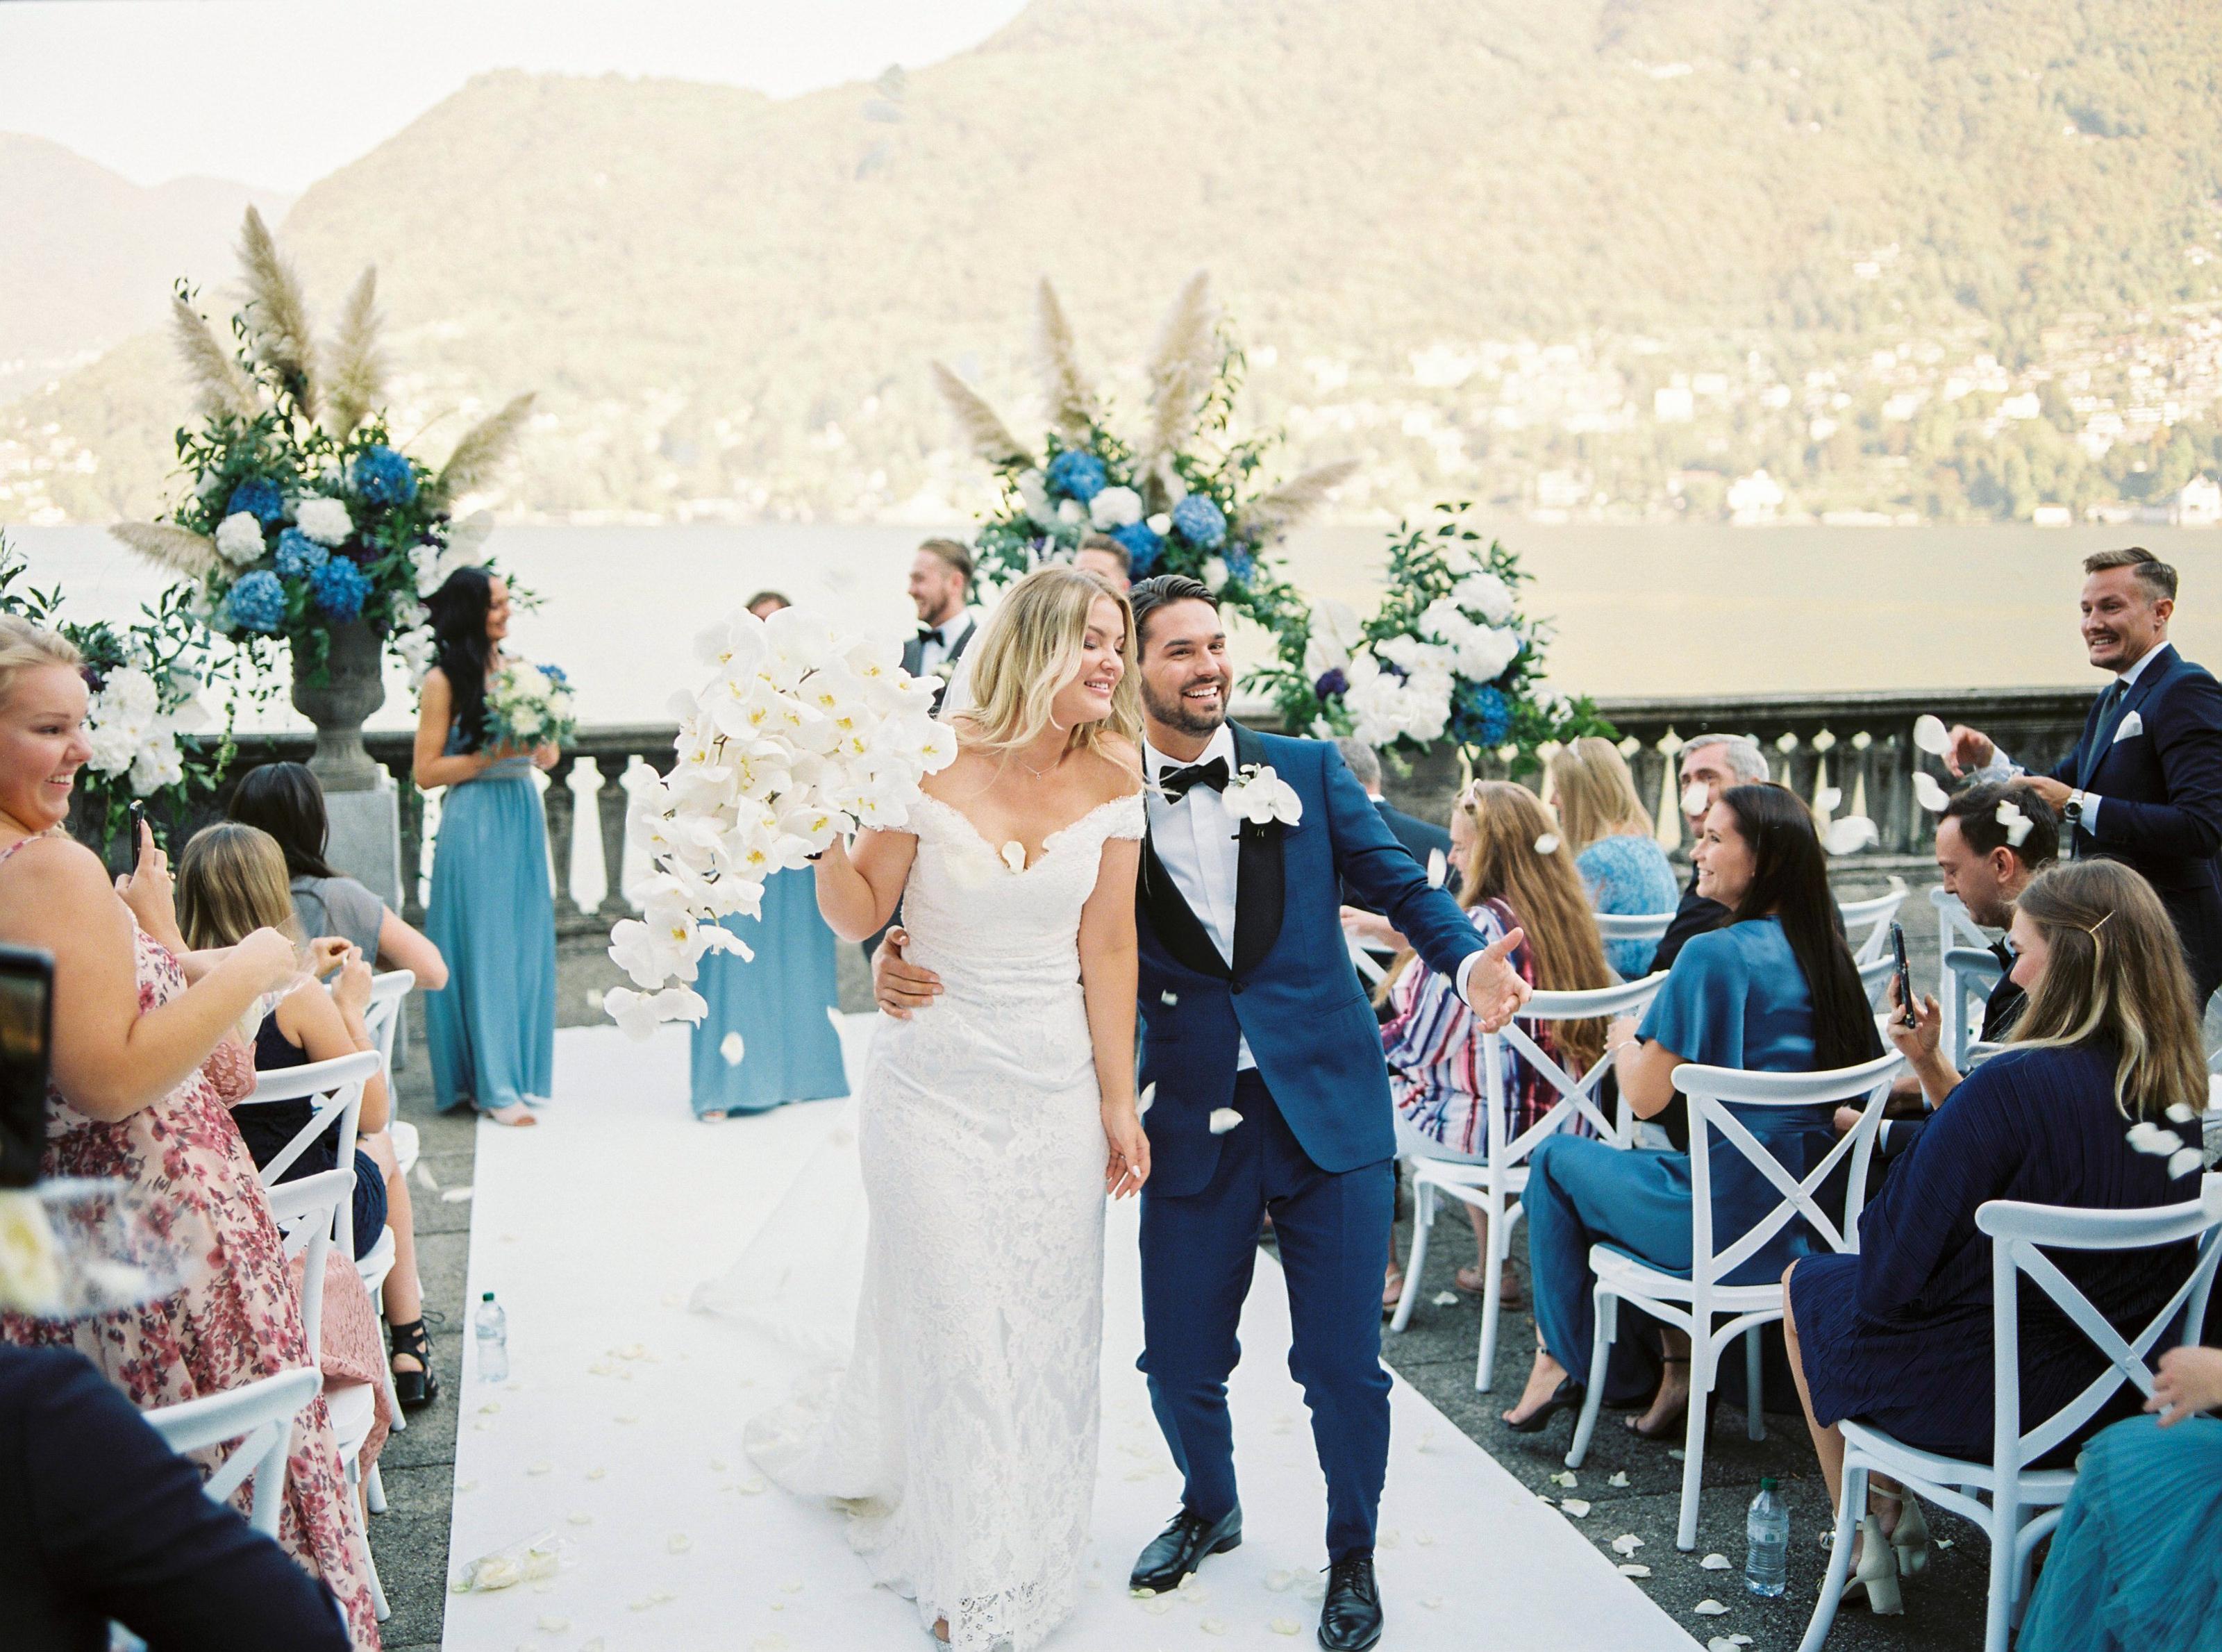 2 BridesPhotography_Molimenti_Wedding_36